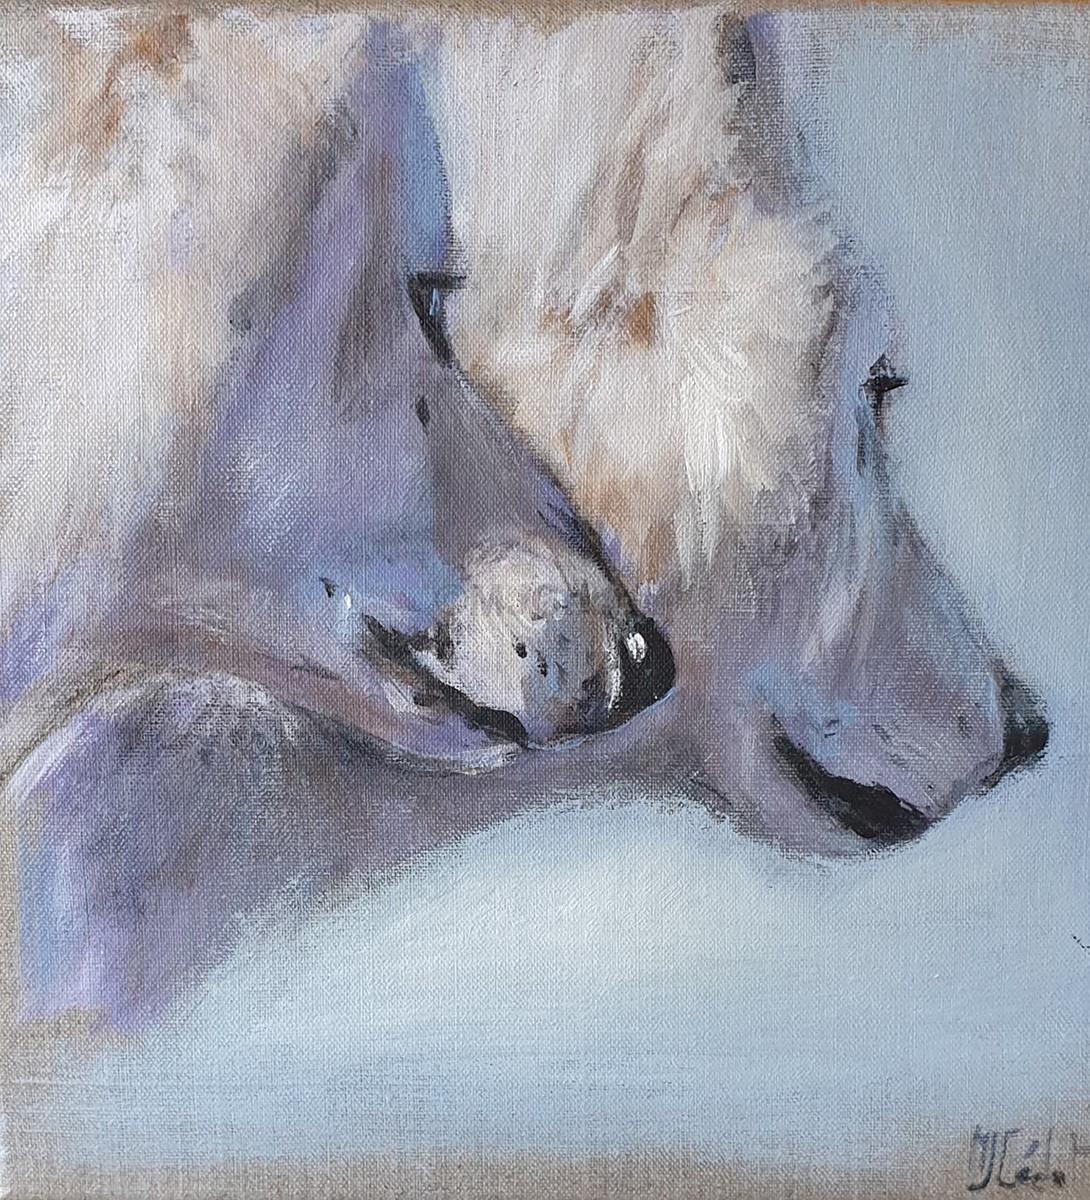 Loups de profils -Marie-Joëlle Cédat-artiste animalier peinture animaliere-art-animalier- peintre-animalier